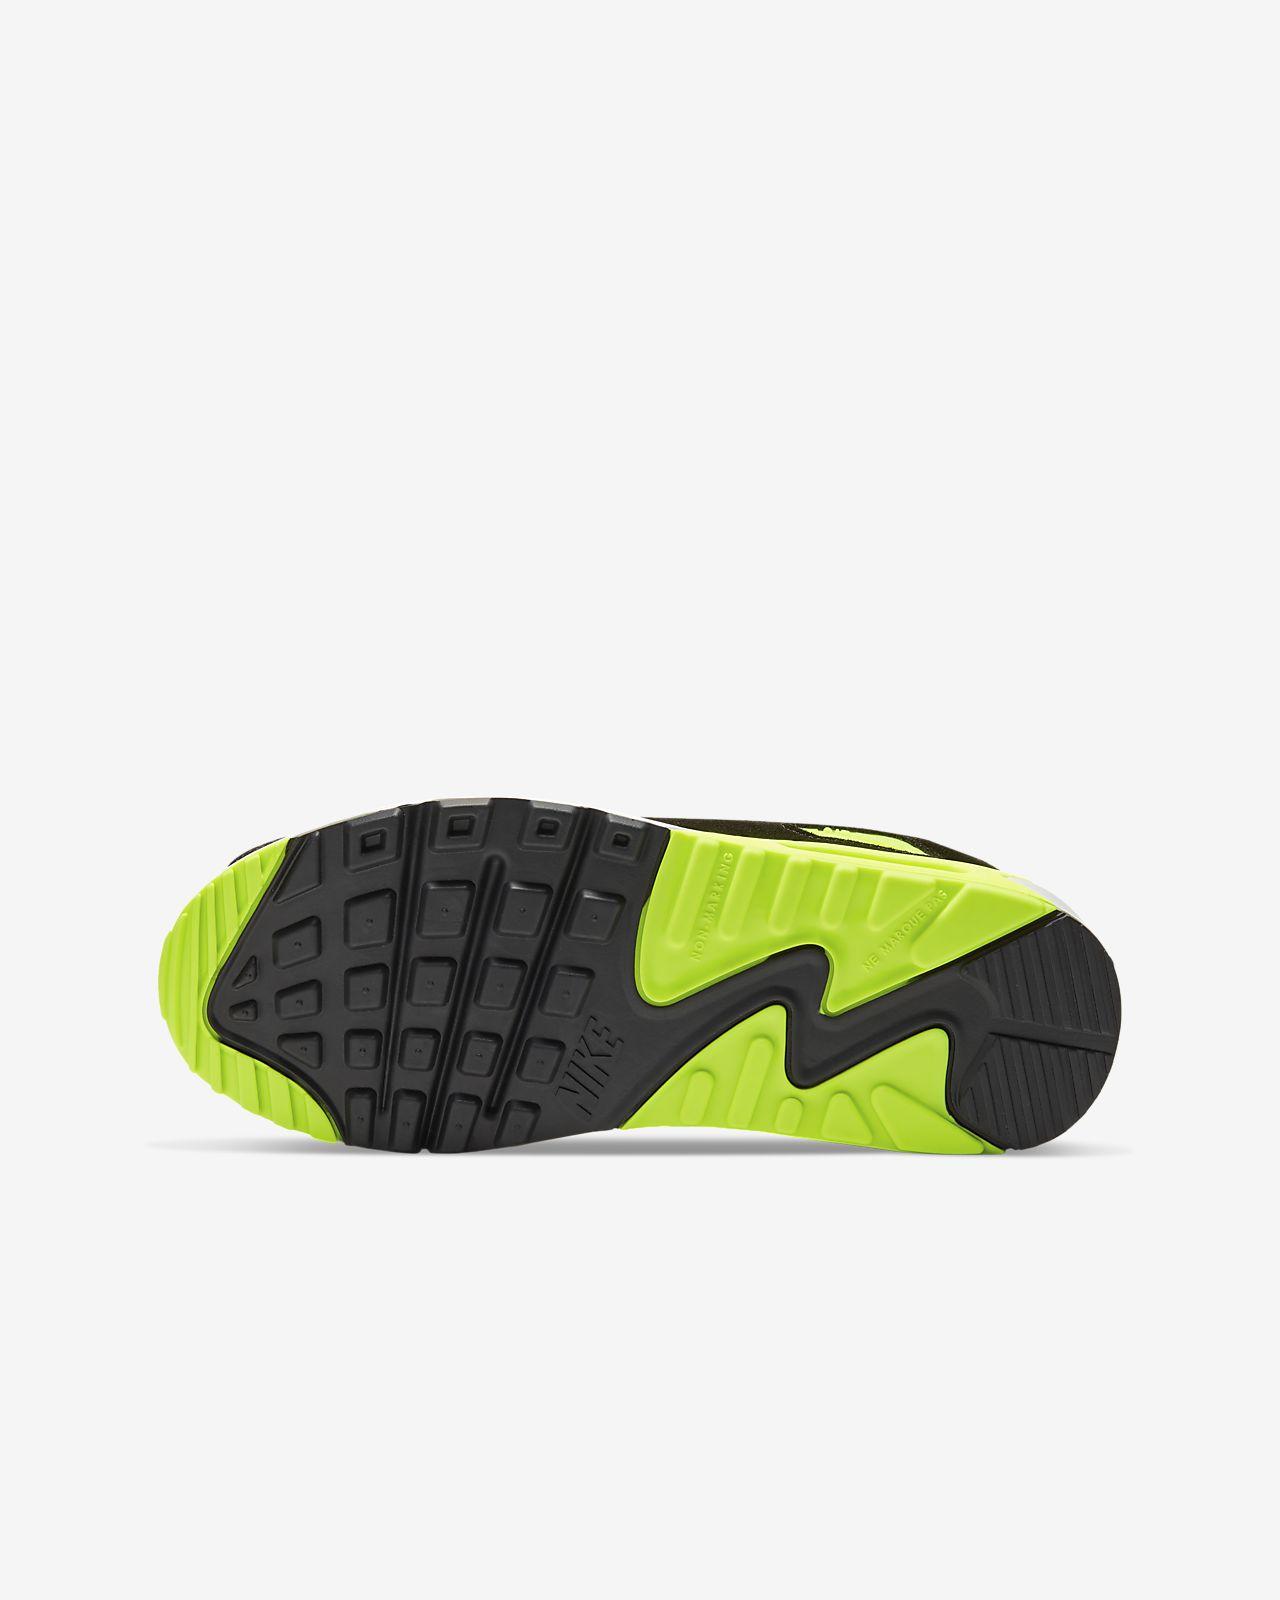 nike free flyknit, Kids Nike Air Max 90 White Black,green